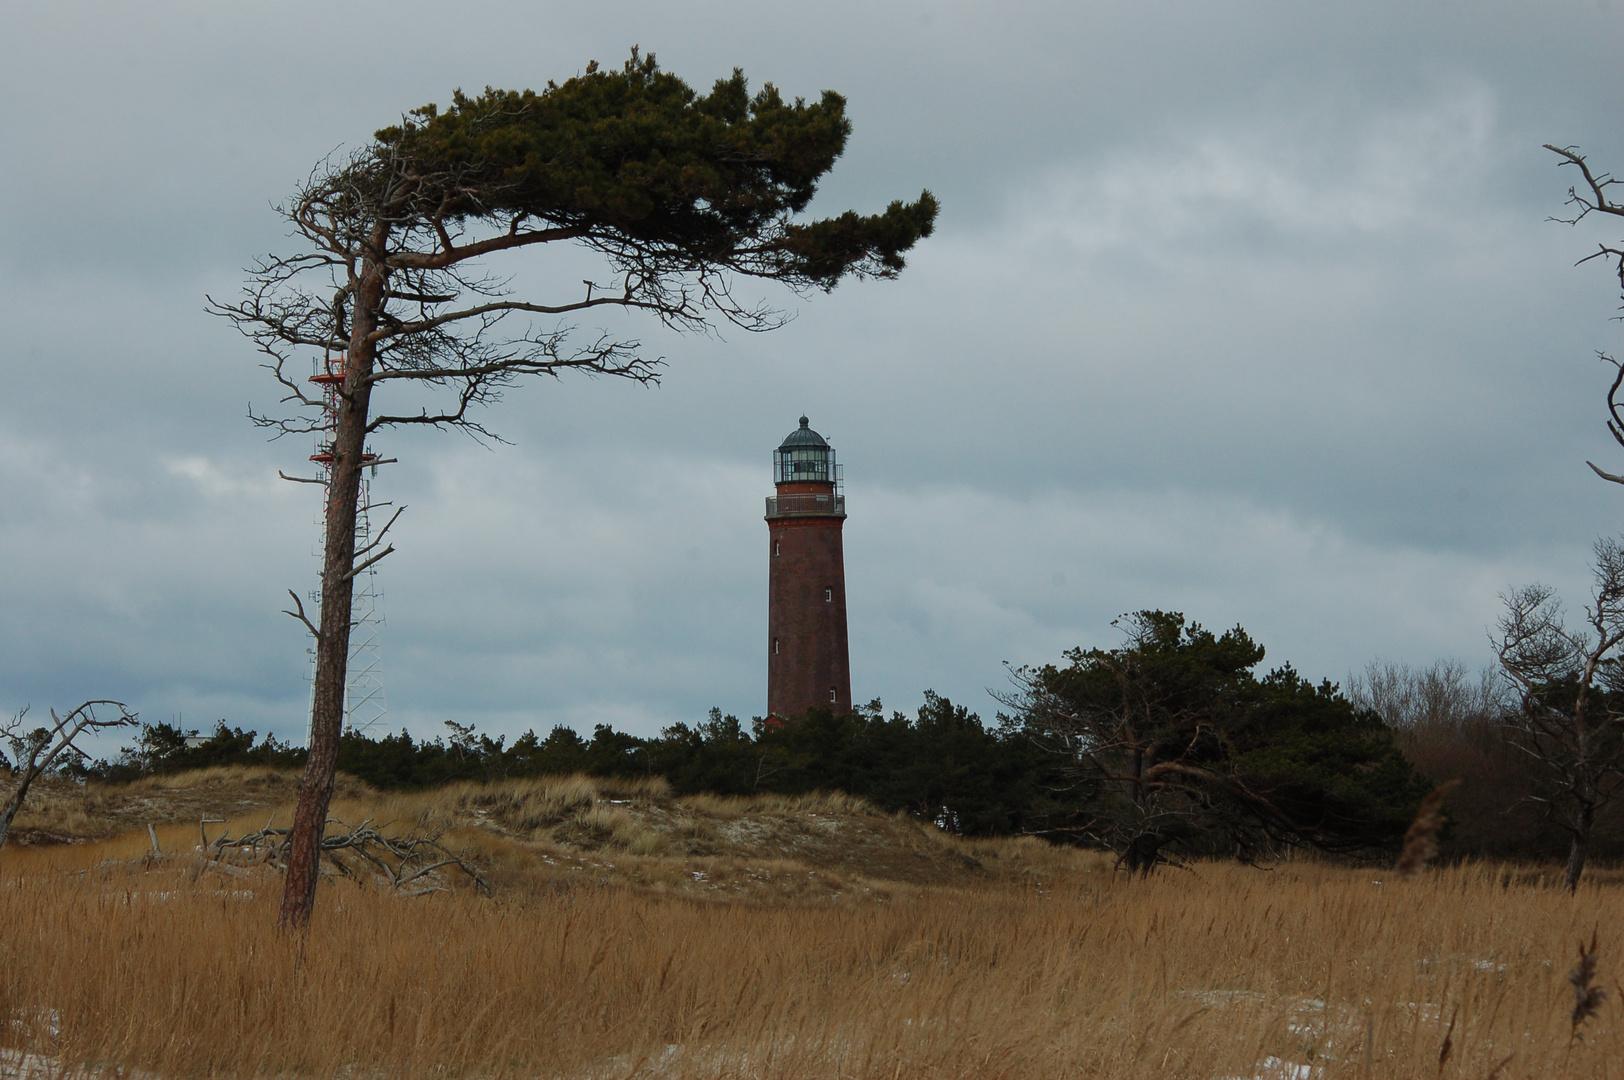 Prerow - Leuchtturm Darßer Ort